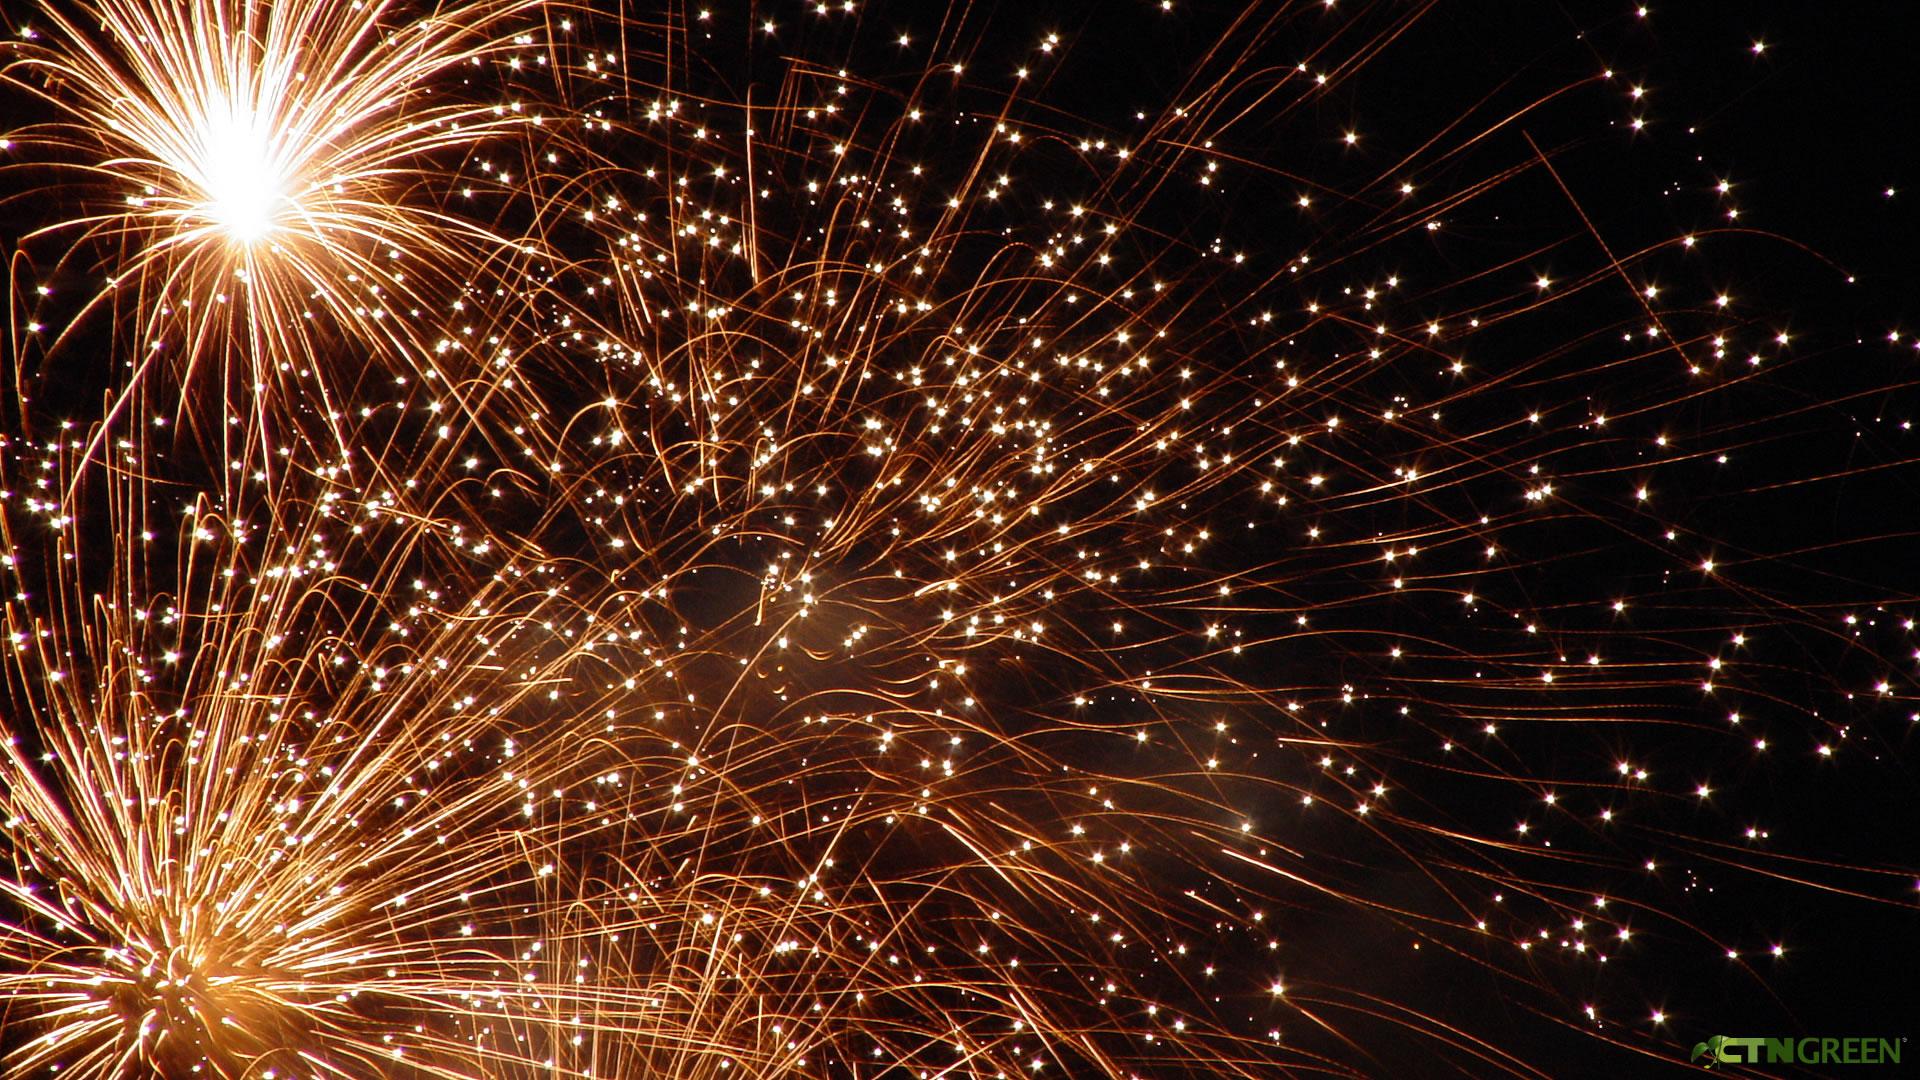 HD Wallpaper Fireworks - WallpaperSafari